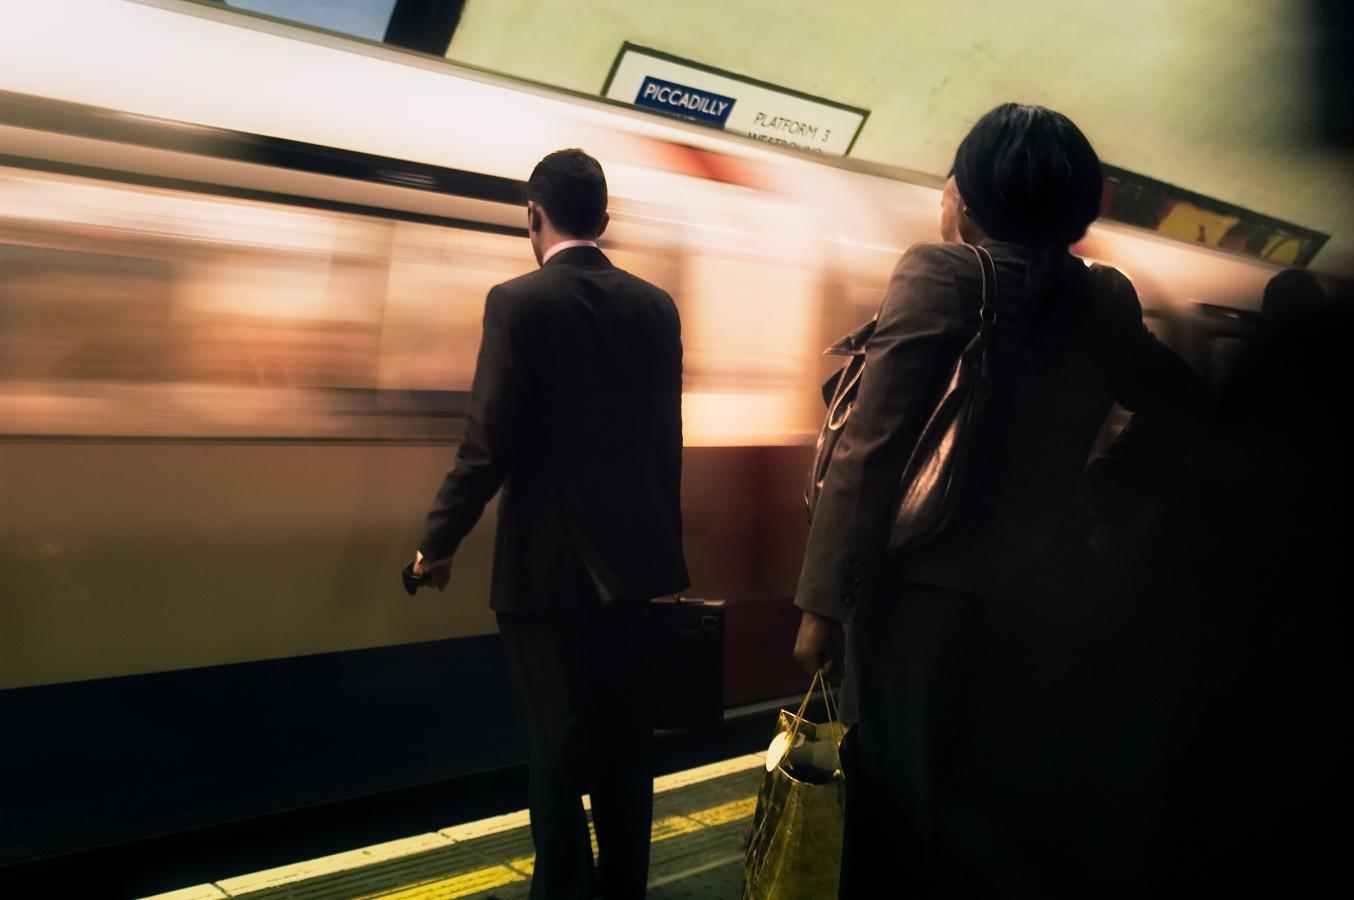 mind-the-gap-london-2007